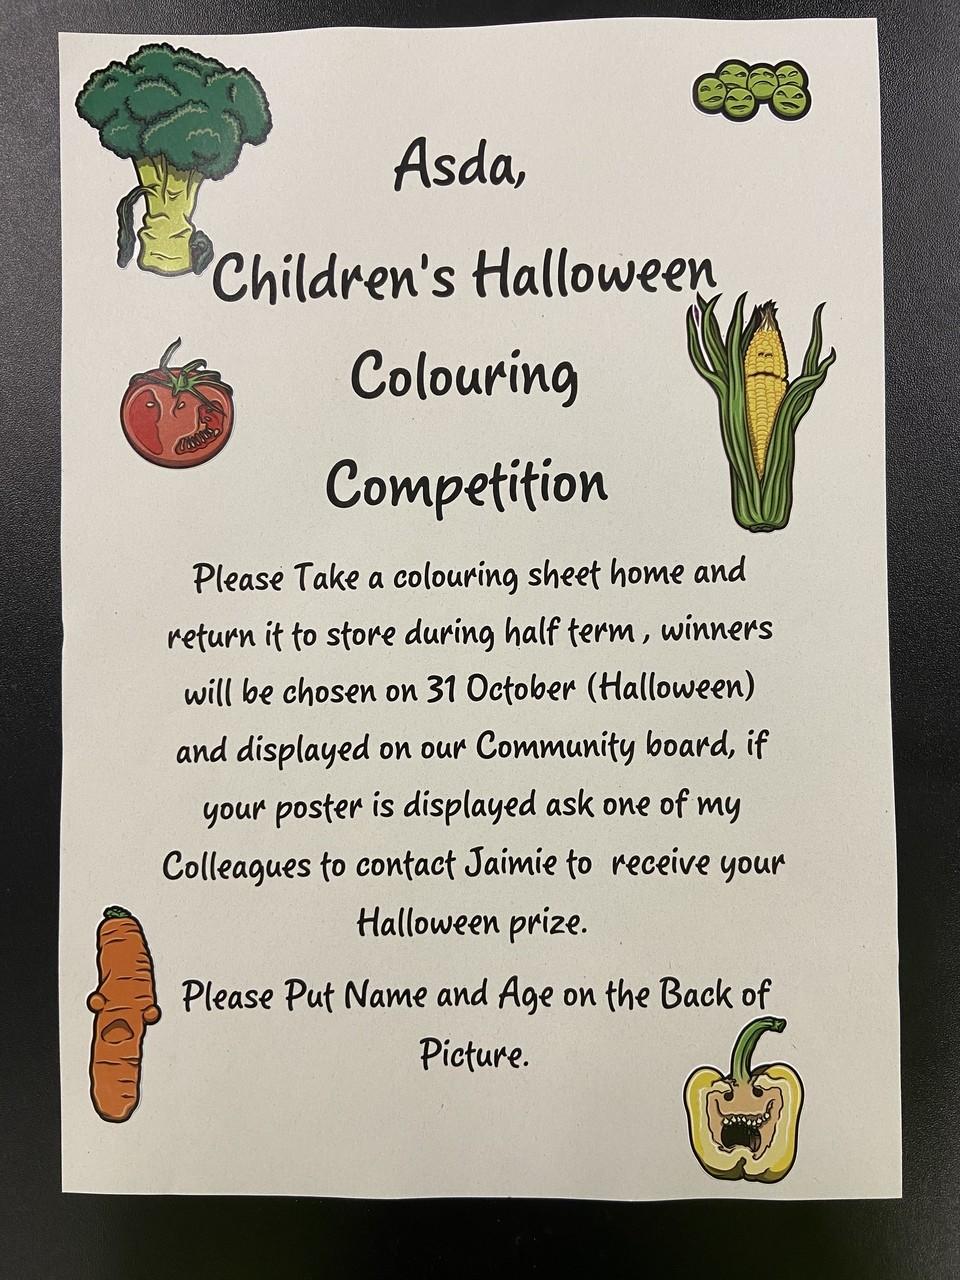 Halloween colouring competition | Asda Biggleswade